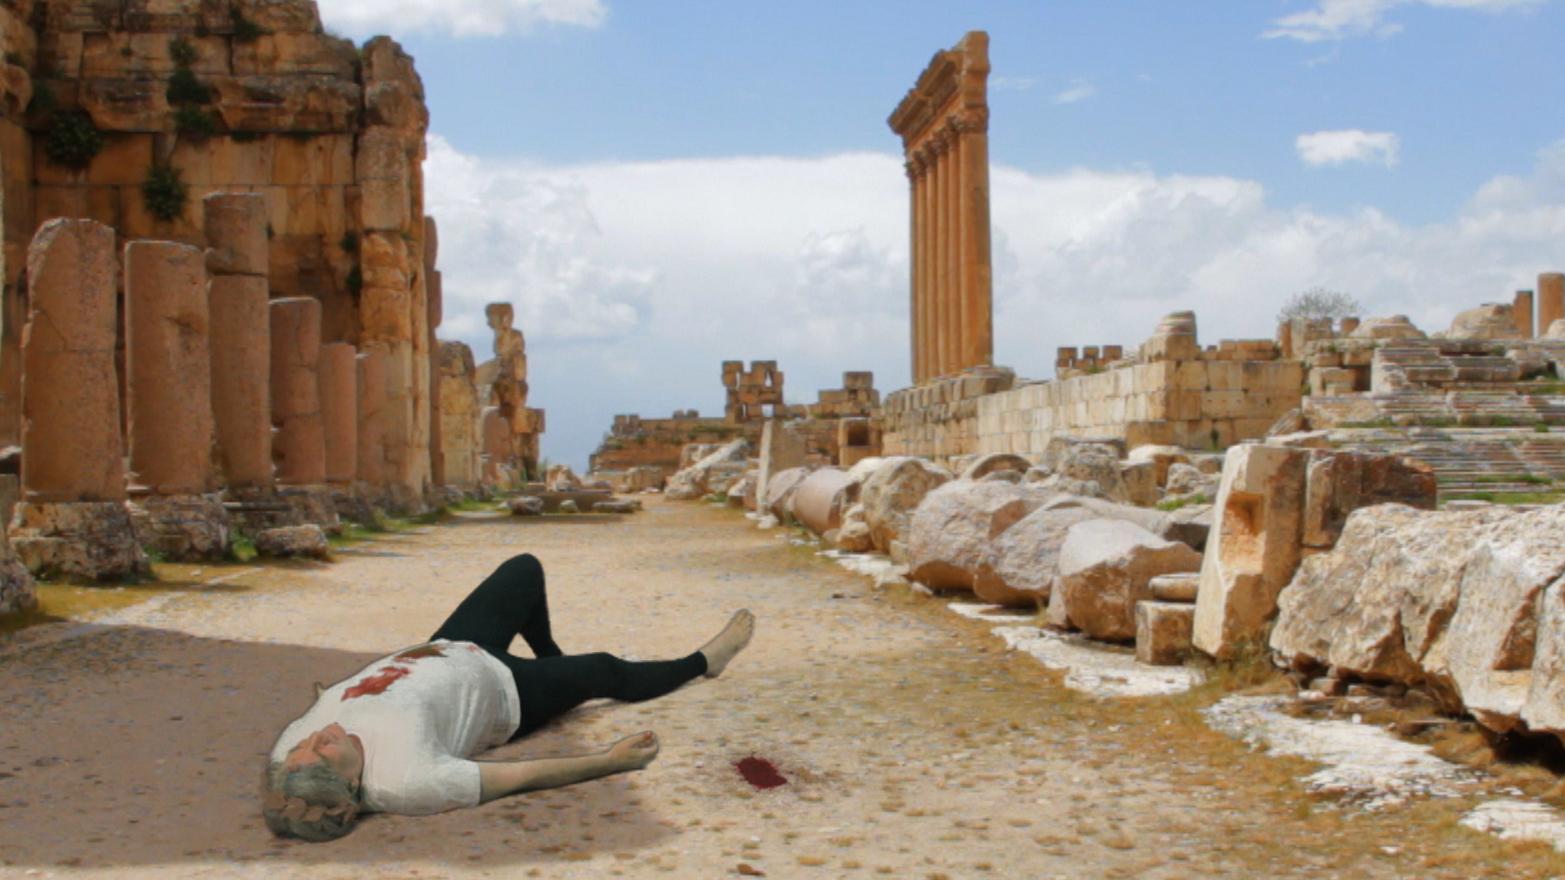 Rehana Zaman, What an artist dies in me/ Exit the Emperor Nero, 2013. Video still.